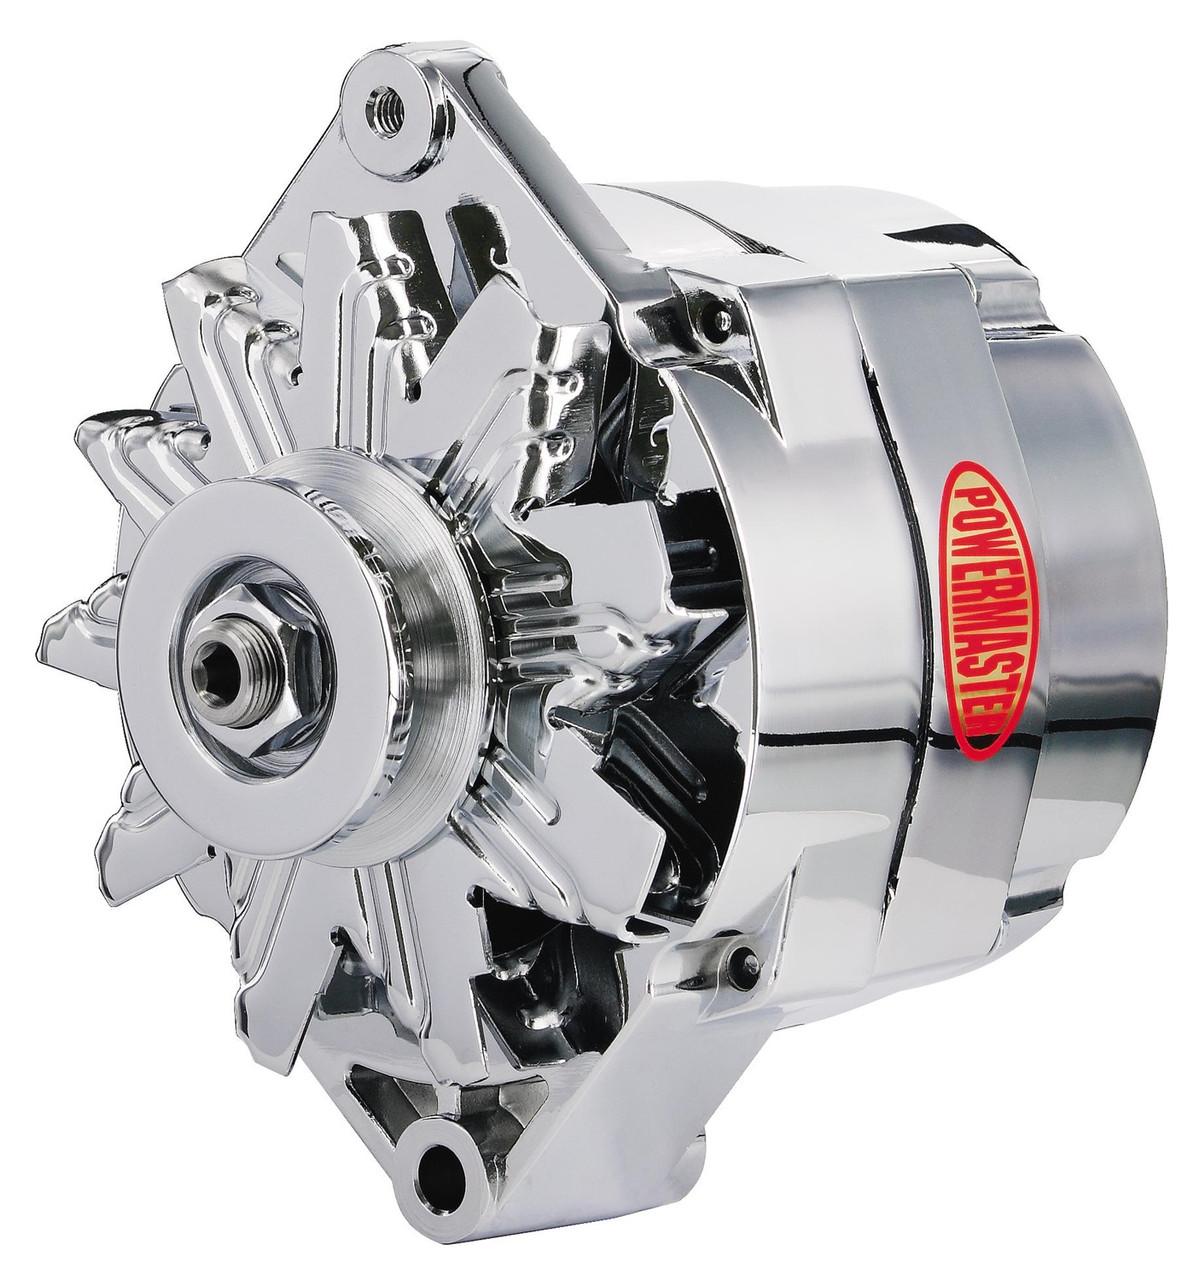 powermaster gm 1-wire 100 amp alternator, chrome - so-cal speed shop az  so-cal speed shop az